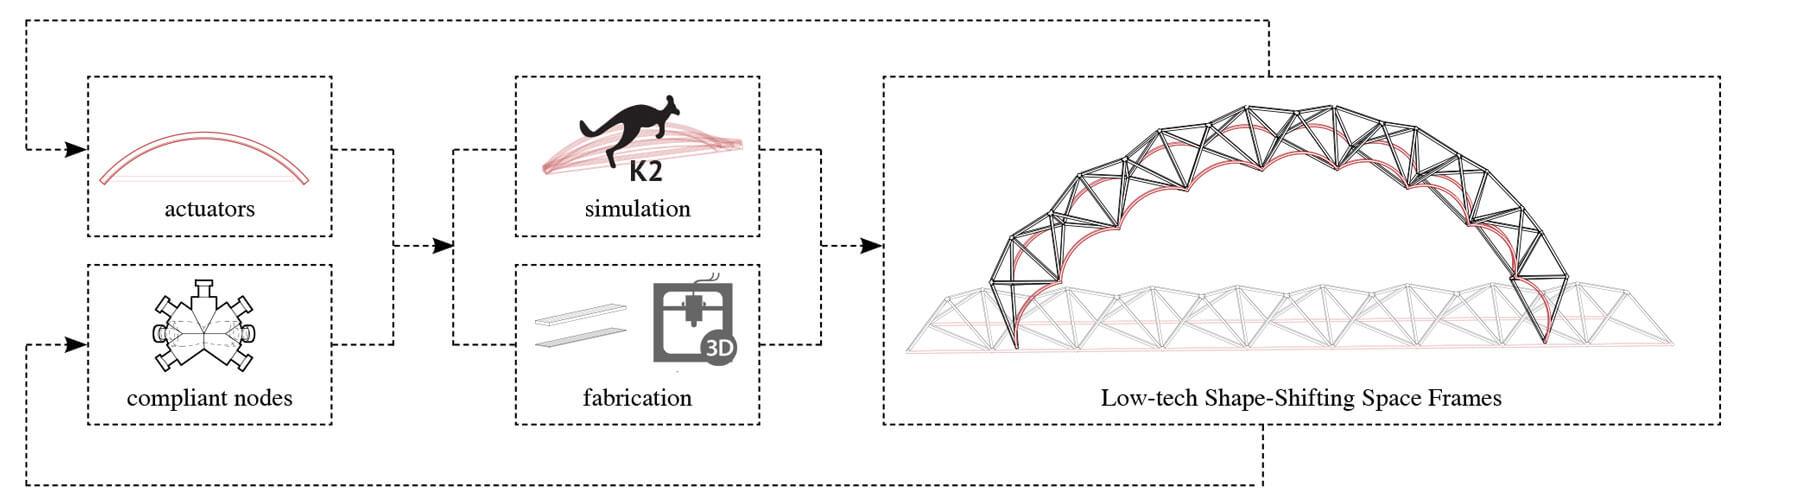 Low-tech Shape-Shifting Space Frames